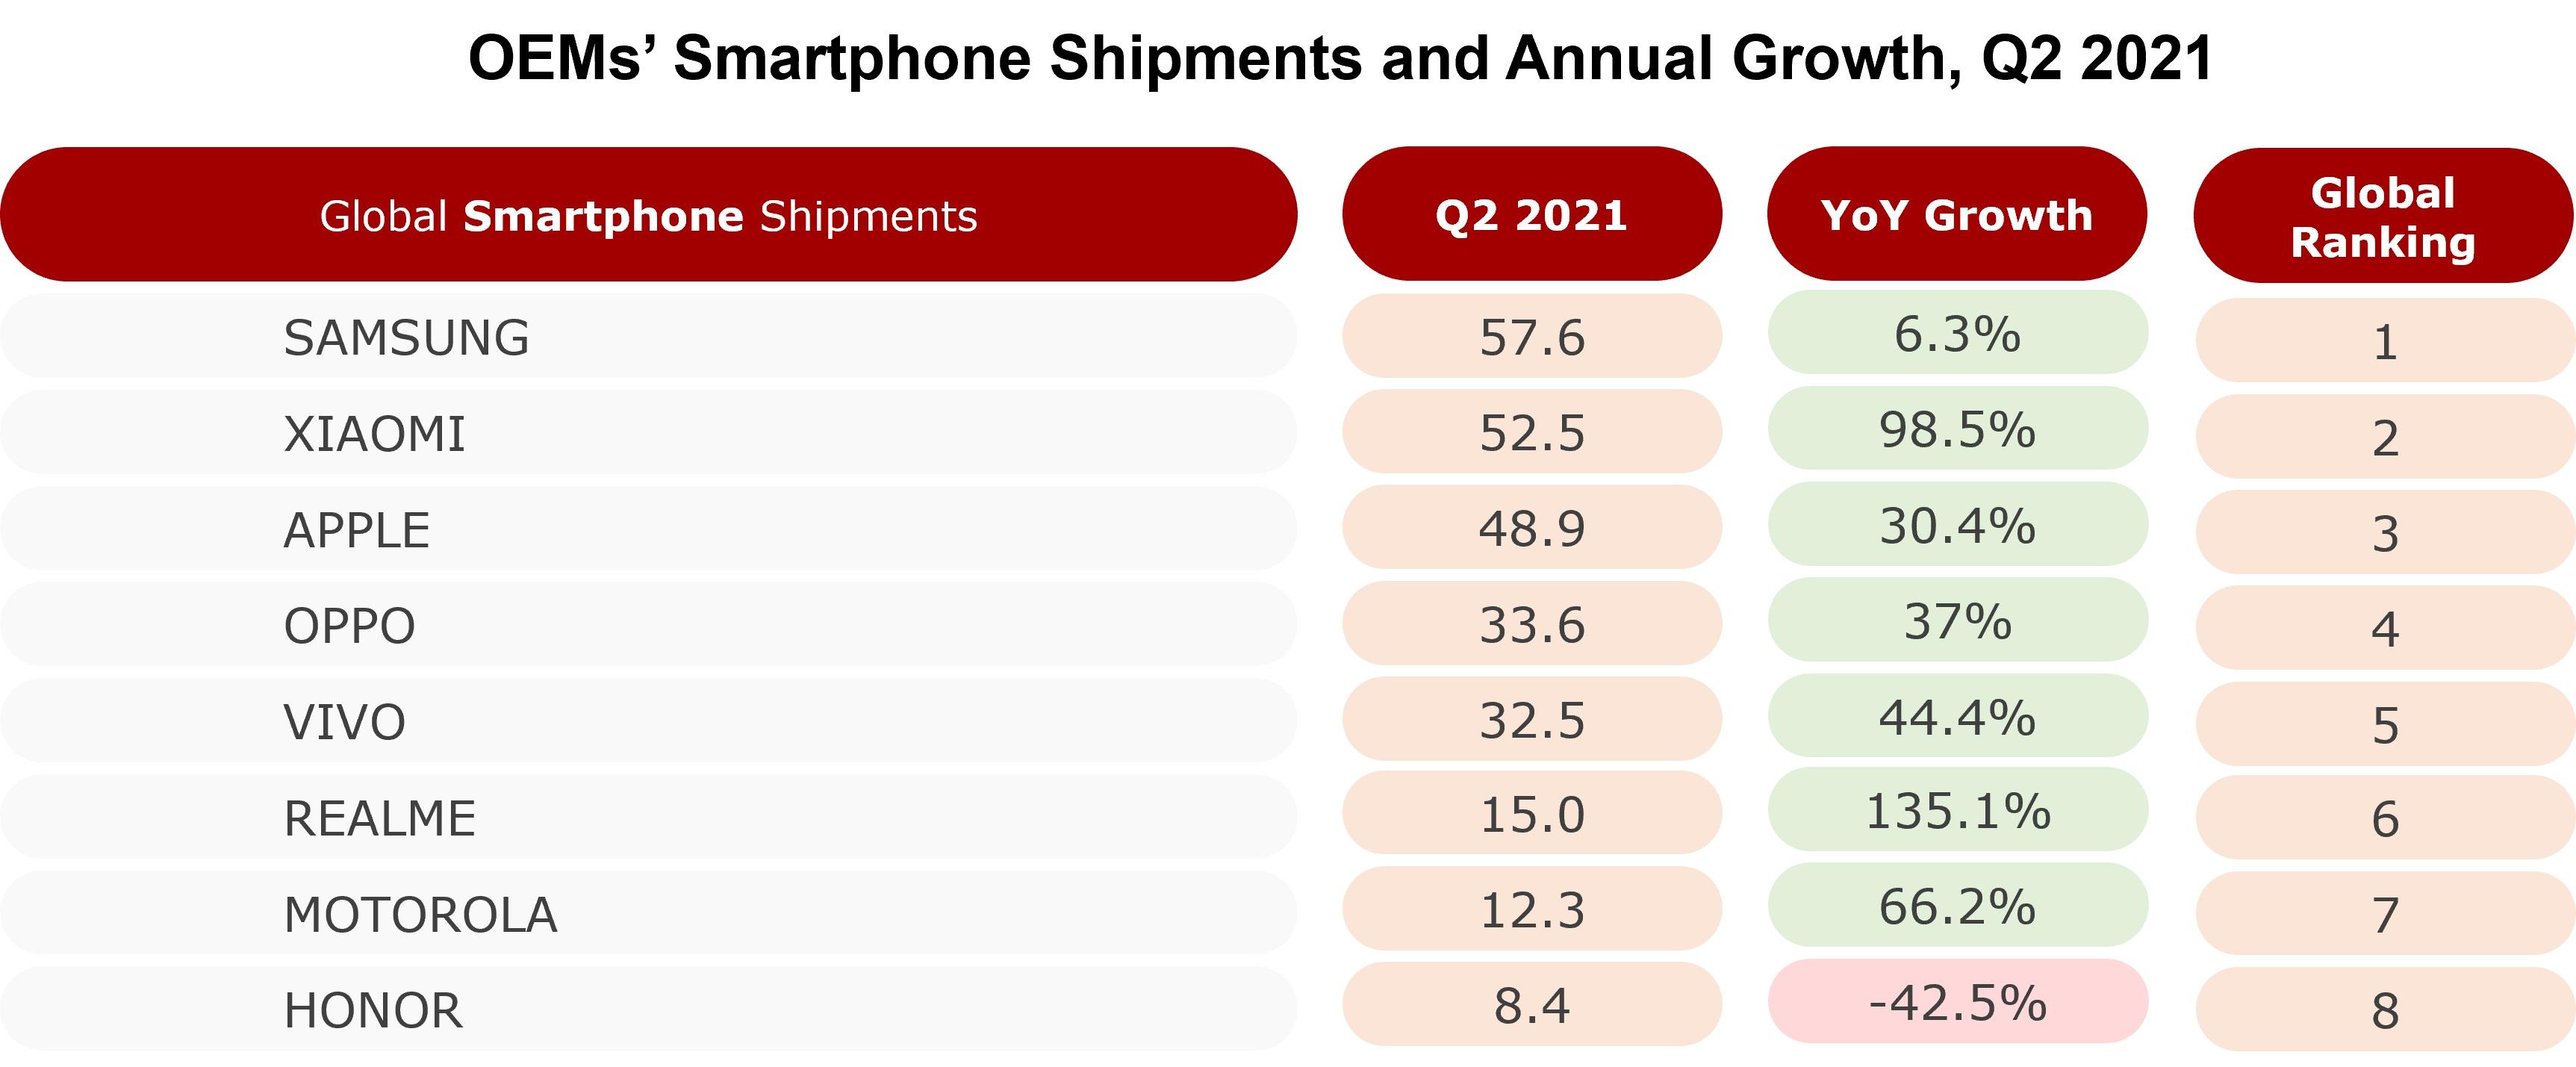 dostawy smartfonów drugi kwartał Q2 2021 Samsung Apple Xiaomi Oppo Vivo realme Motorola Honor Counterpoint Research